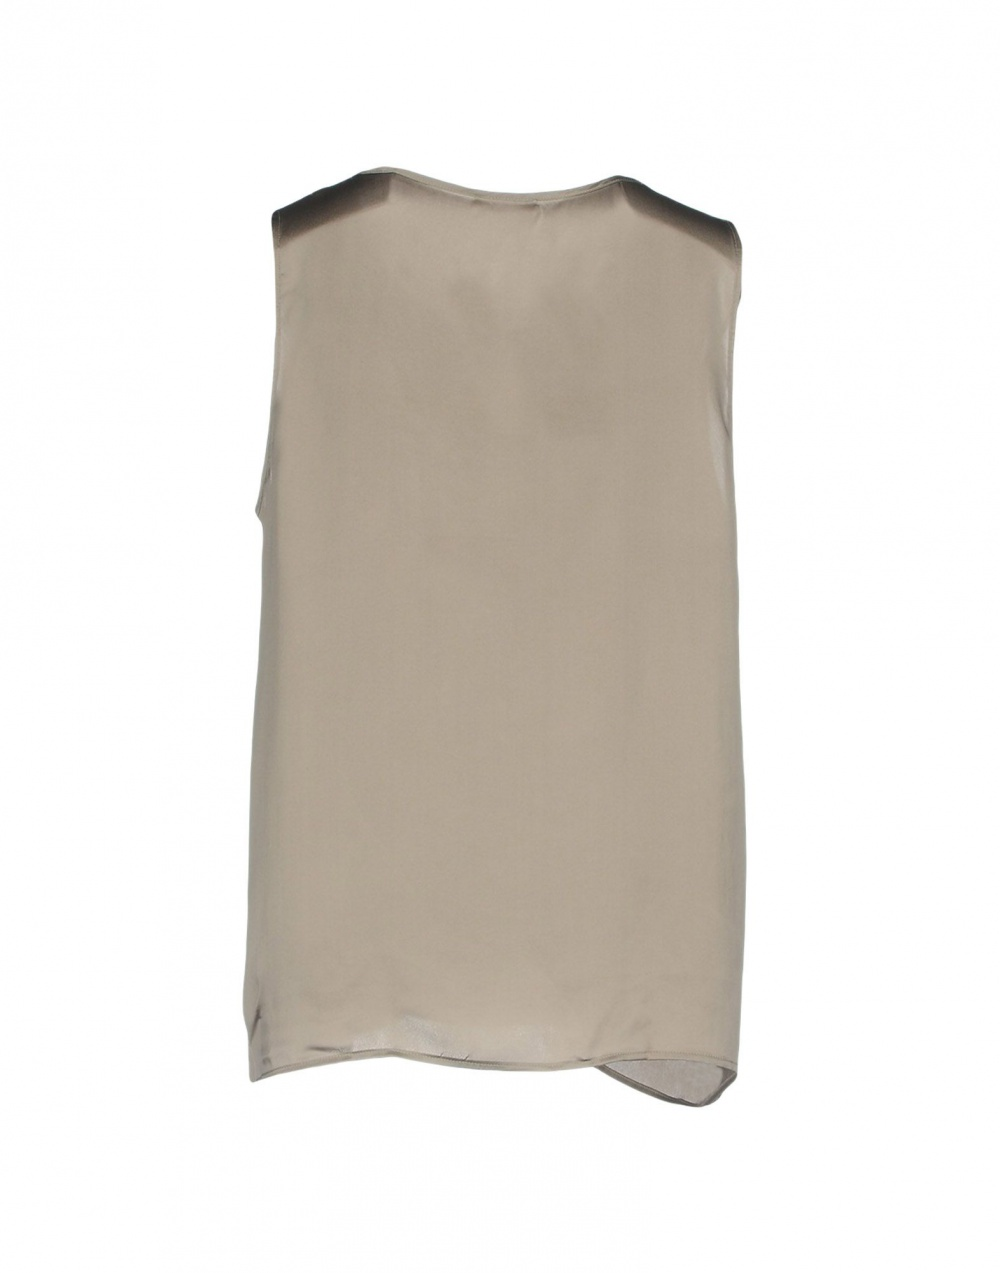 Топ GRAN SASSO, 48-50 размер